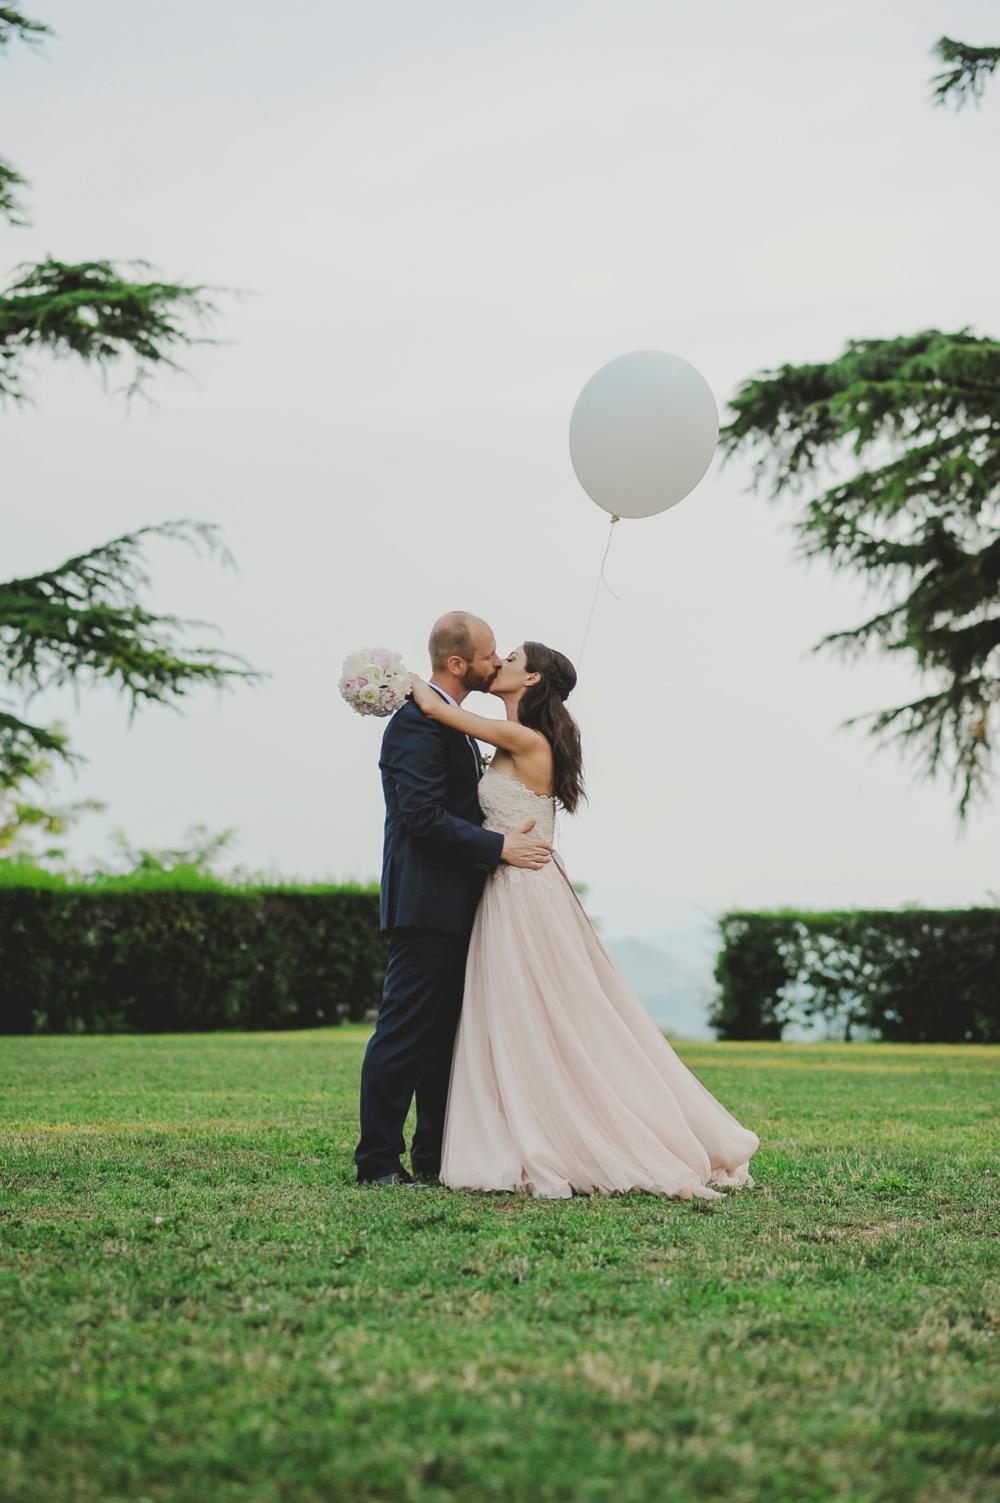 Gloria_Umberto_Landvphotography_wedding_borgodellarocca_0130.jpg